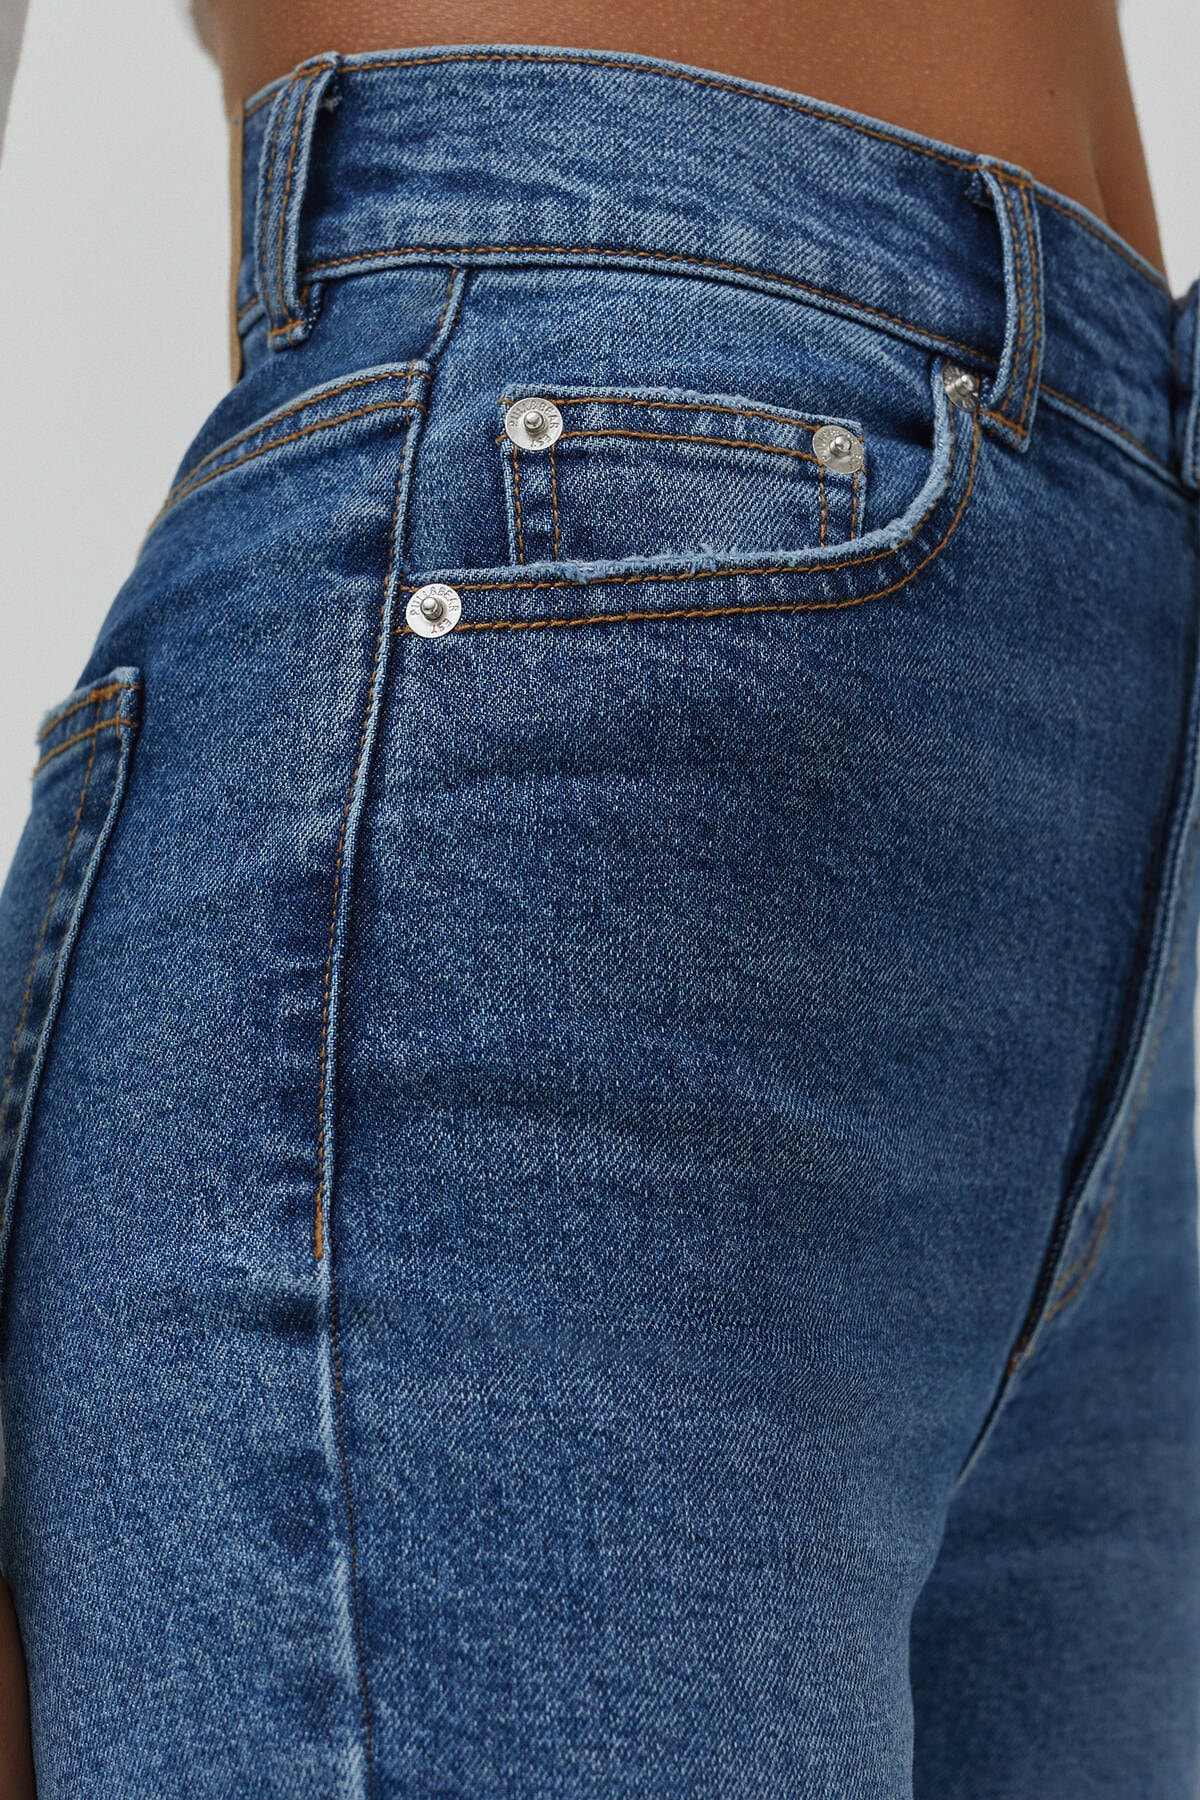 Pull & Bear Kadın Mavi Süper Yüksek Bel Slim Fit Mom Jean 04681315 2